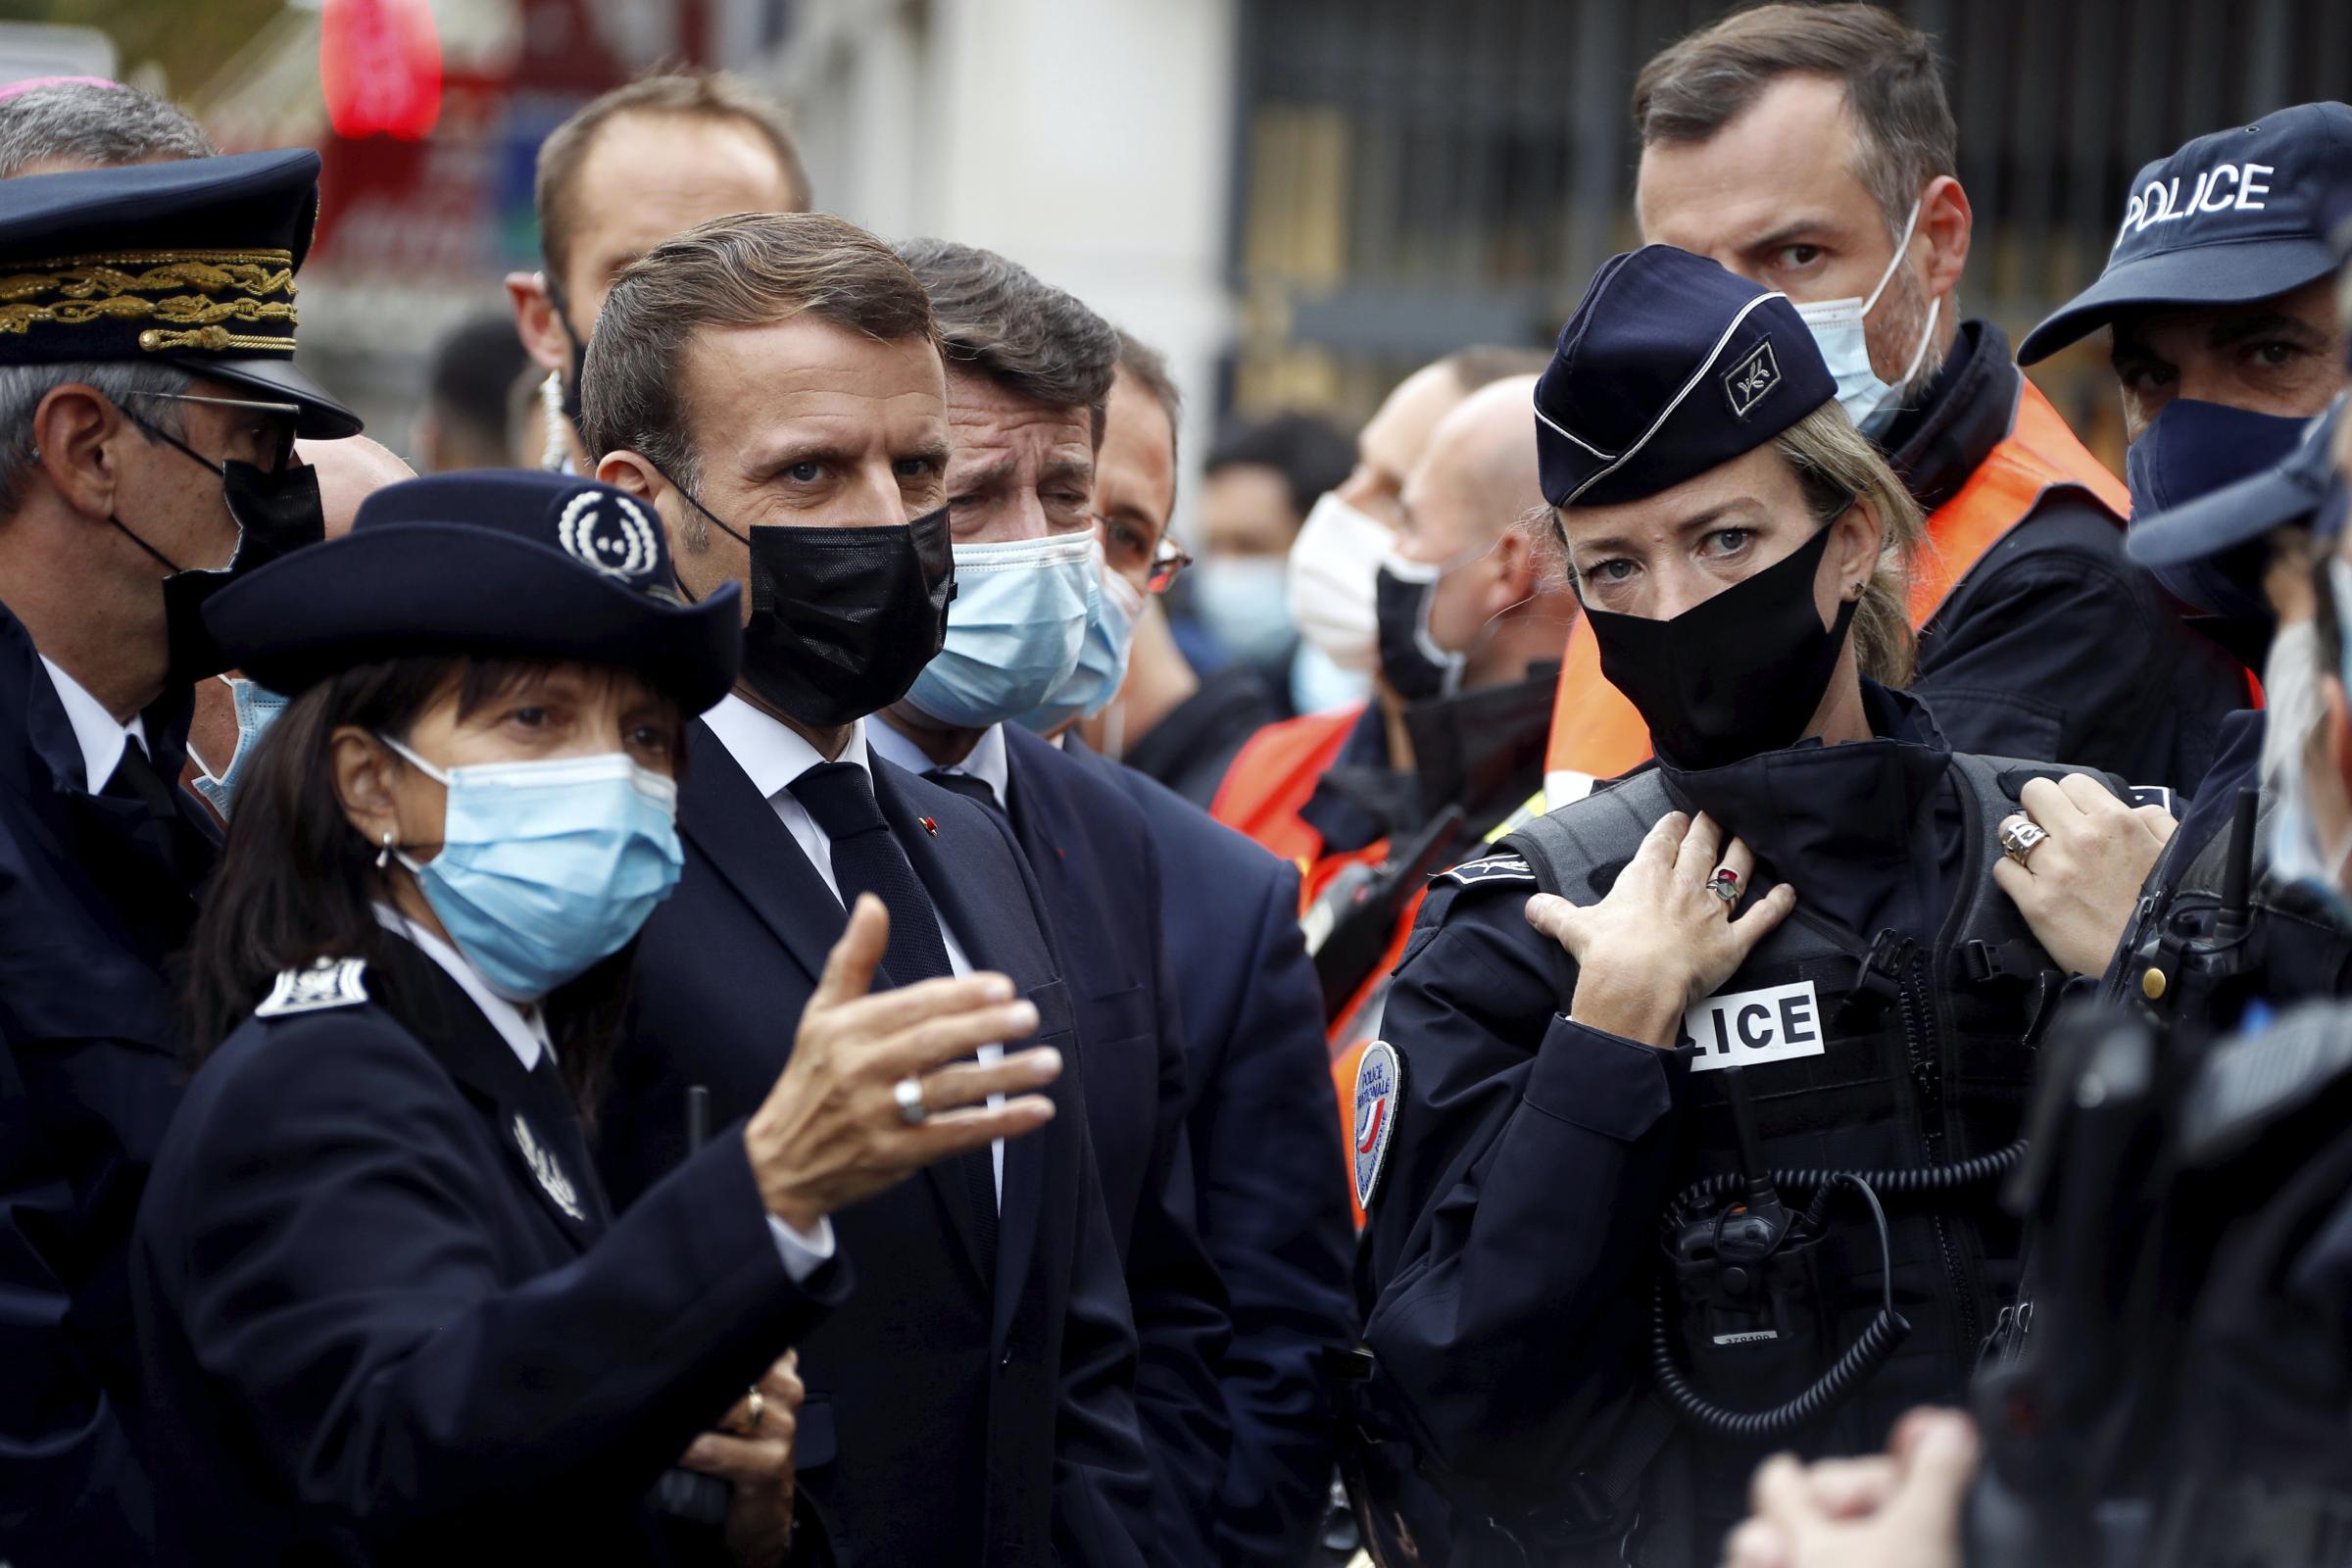 Macron and police